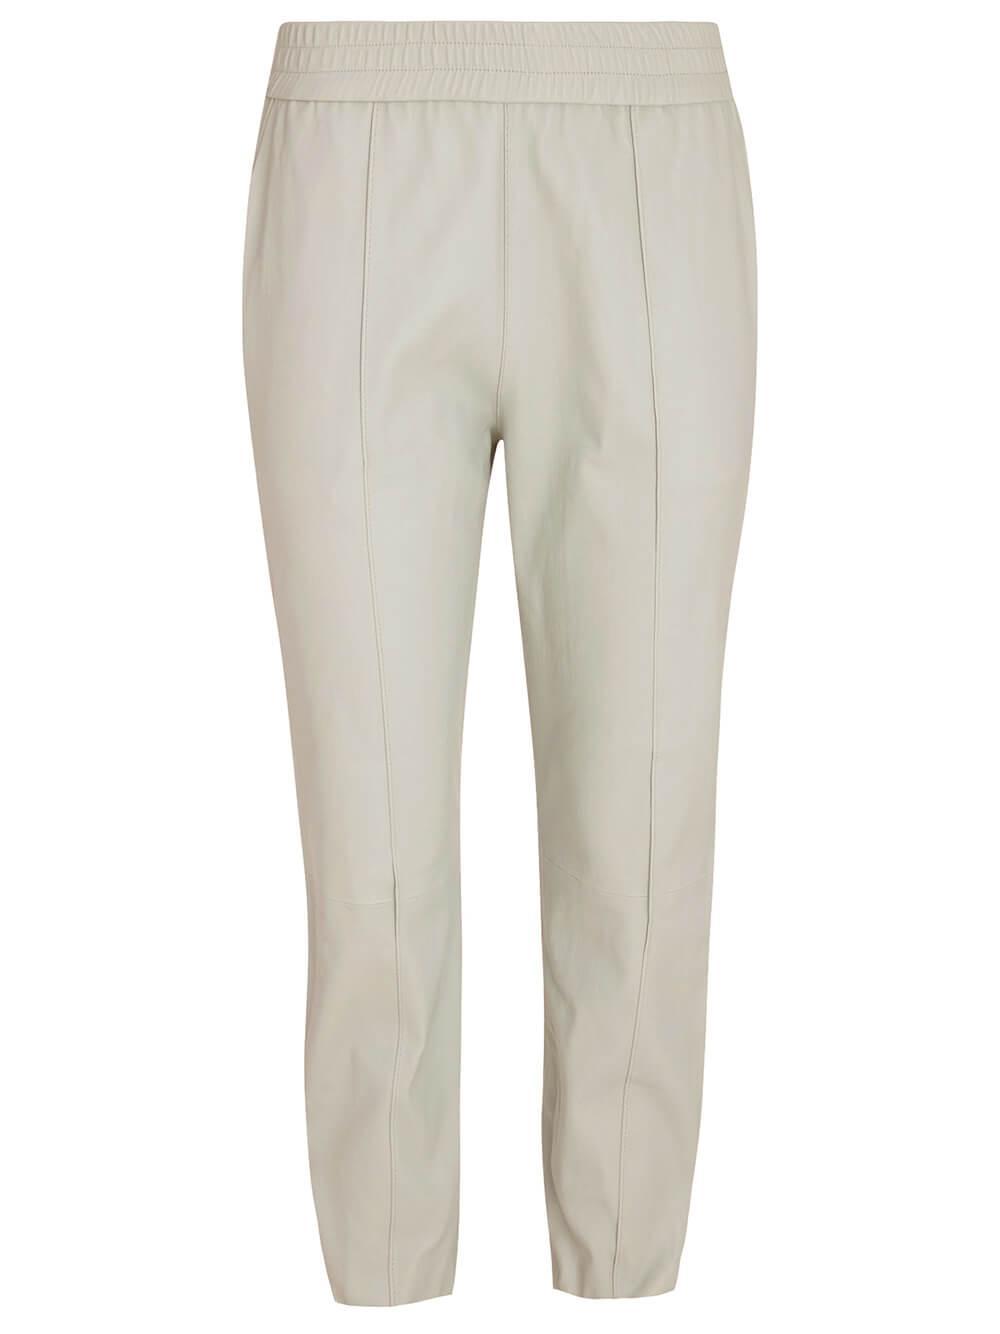 Slim Jogger With Pockets Item # JOG006L